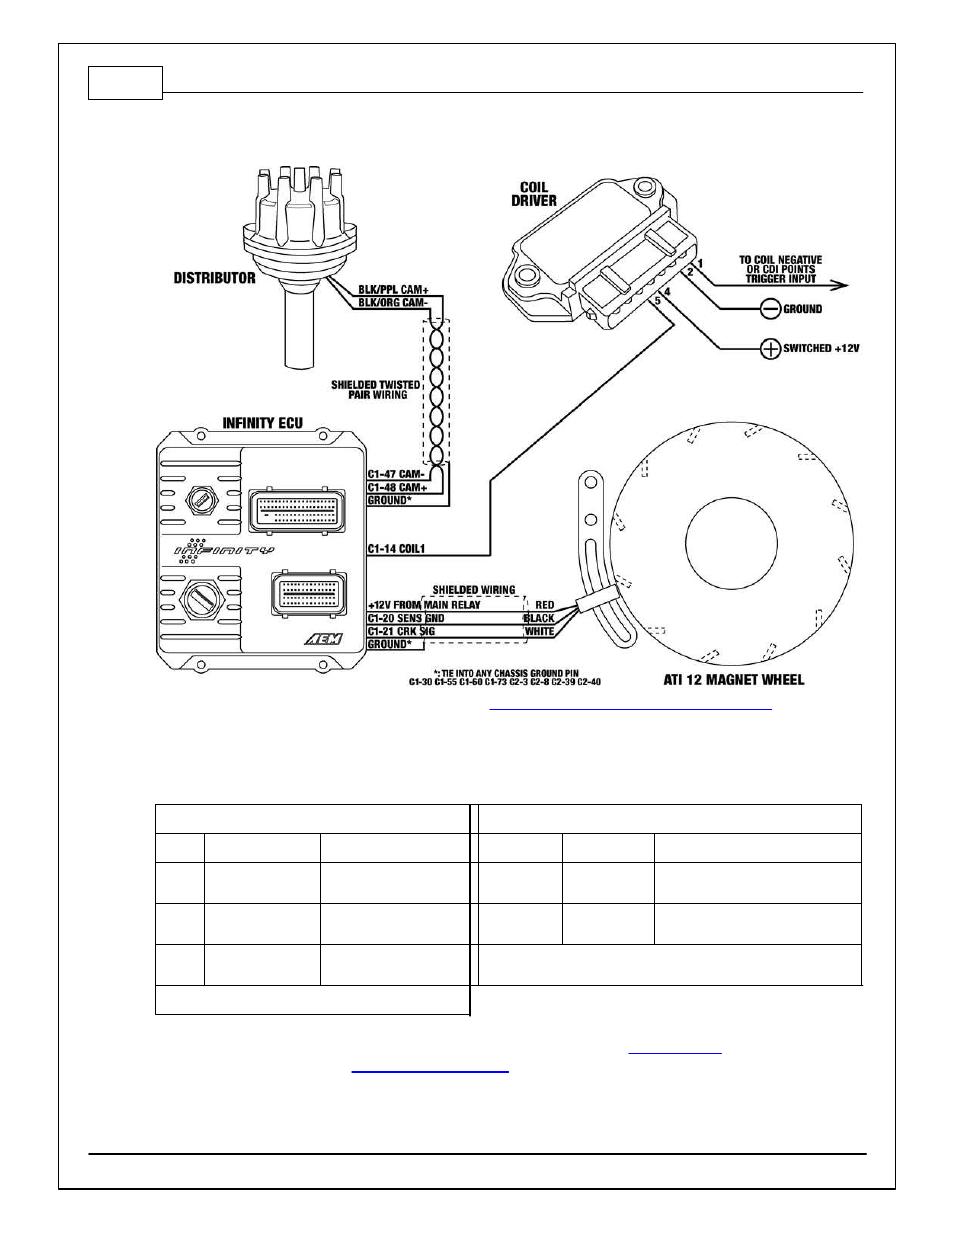 medium resolution of aem infinity supported applications universal v8 engine user rh manualsdir com